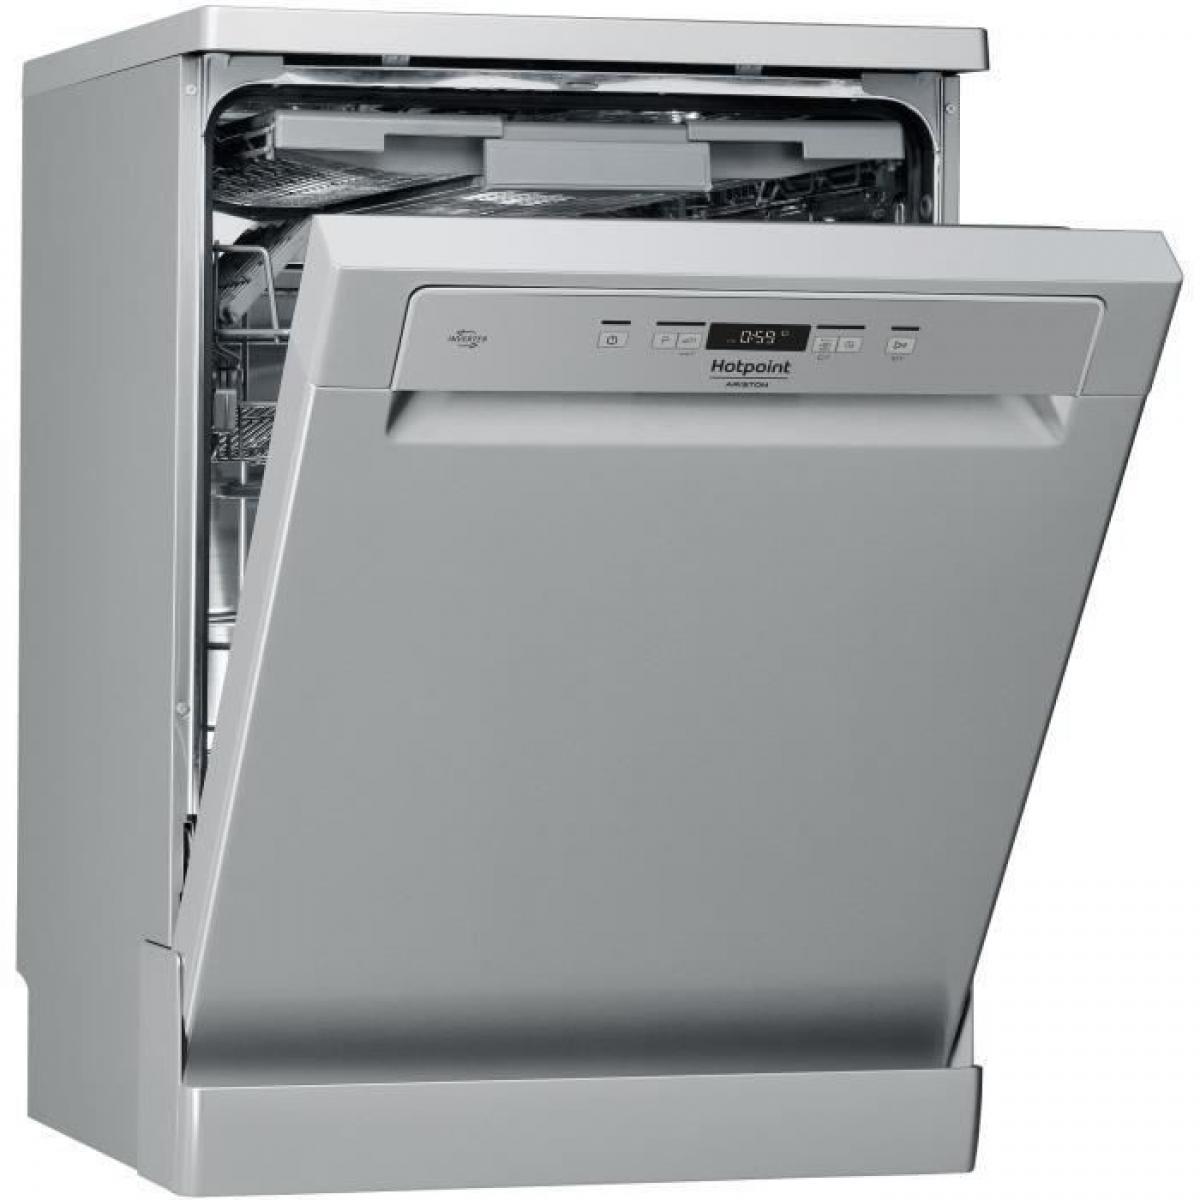 Hotpoint Lave-vaisselle pose libre HOTPOINT 14 Couverts 60cm, HOT8050147055168